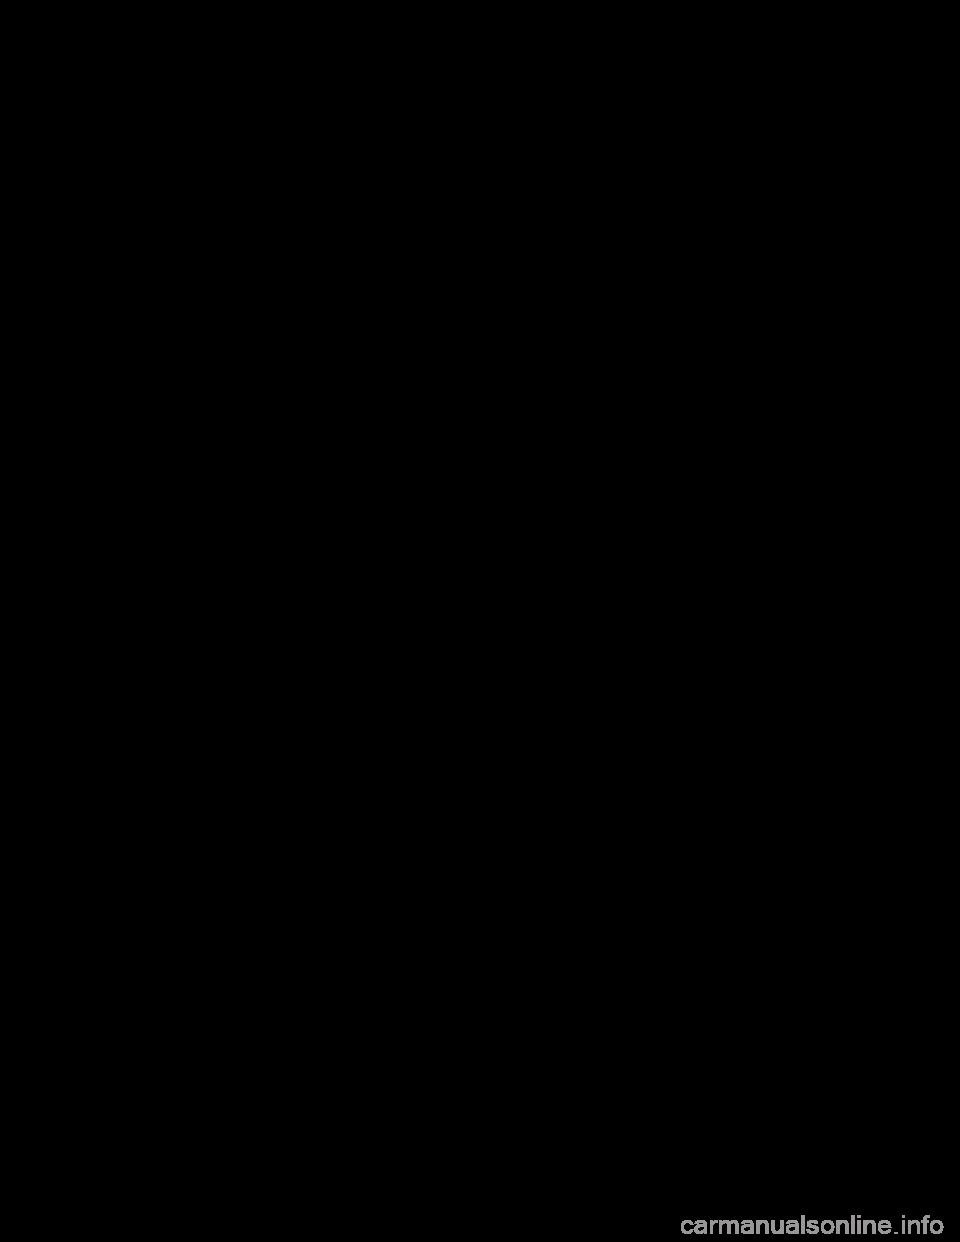 TOYOTA CAMRY 1994 XV10 / 4.G on volvo s40 wiring harness, amc amx wiring harness, plymouth duster wiring harness, chevy aveo wiring harness, honda s2000 wiring harness, 2007 toyota wiring harness, hummer h2 wiring harness, hyundai veloster wiring harness, pontiac grand am wiring harness, toyota corolla wiring harness, kia sportage wiring harness, mazda rx8 wiring harness, geo metro wiring harness, geo tracker wiring harness, dodge intrepid wiring harness, chrysler engine wiring harness, chevy cobalt wiring harness, toyota engine wiring harness, ford f100 wiring harness, mazda rx7 wiring harness,